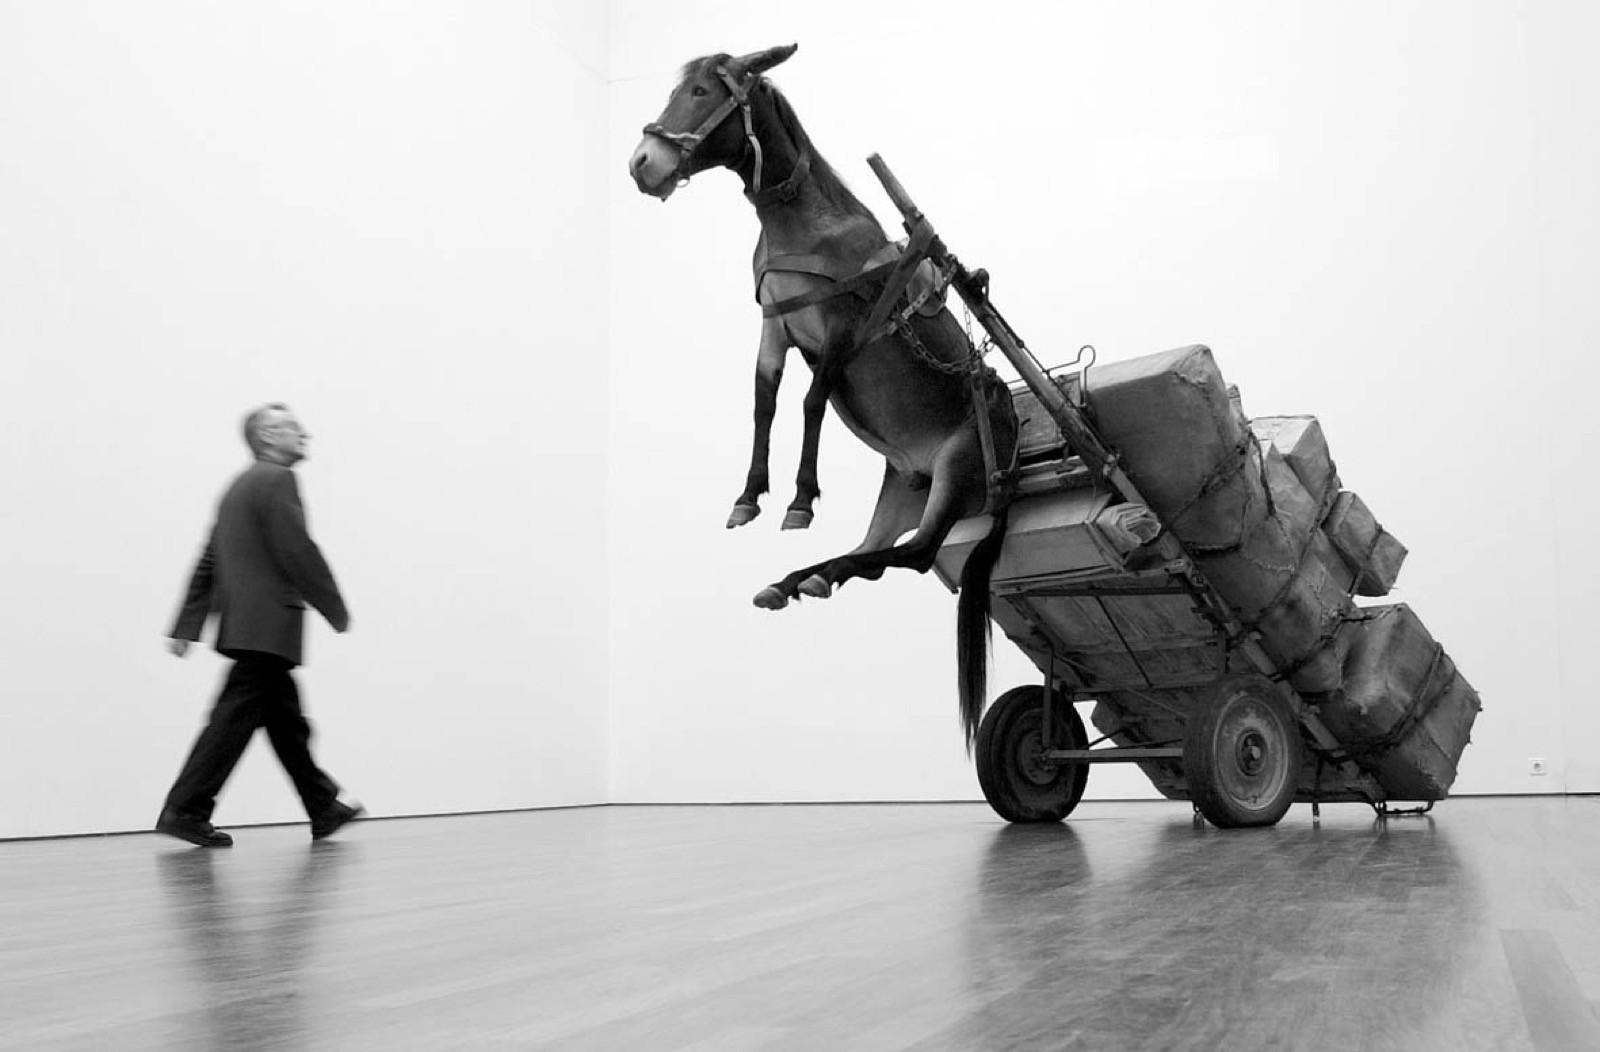 Donkey cart Tipped Up